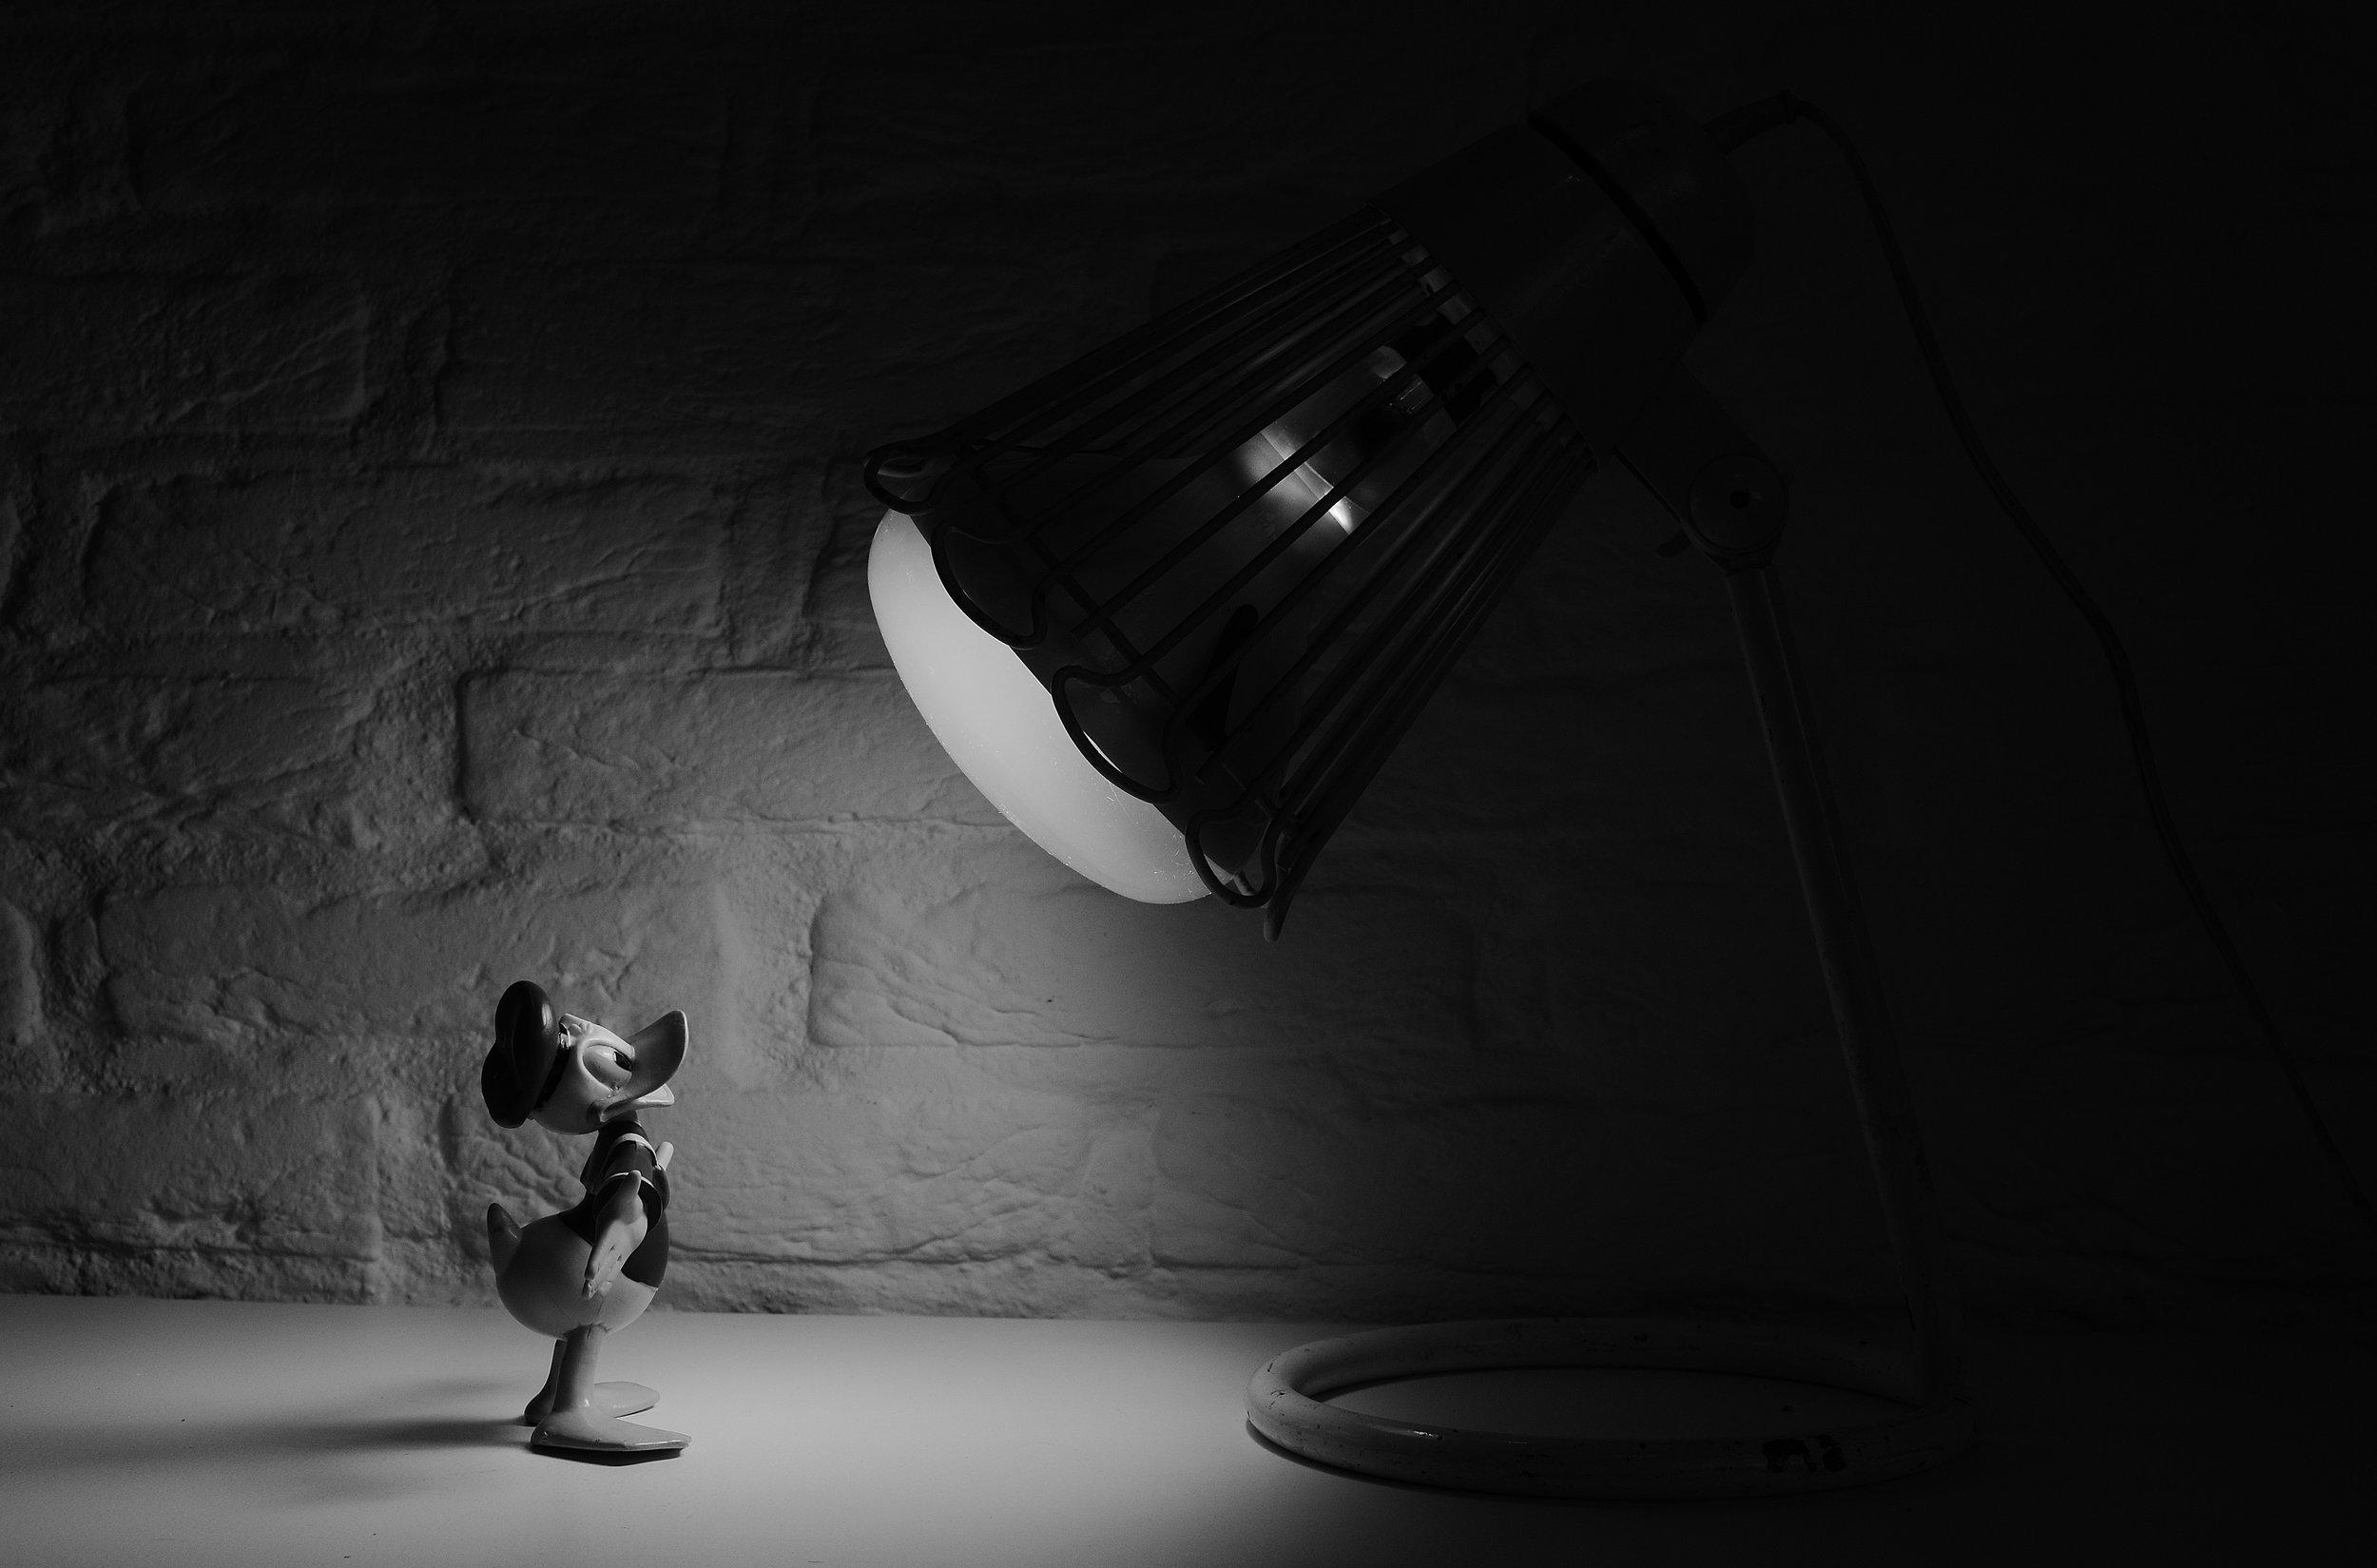 On the spot: Skitter photo https://www.pexels.com/photo/black-and-white-cartoon-donald-duck-spotlight-3706/